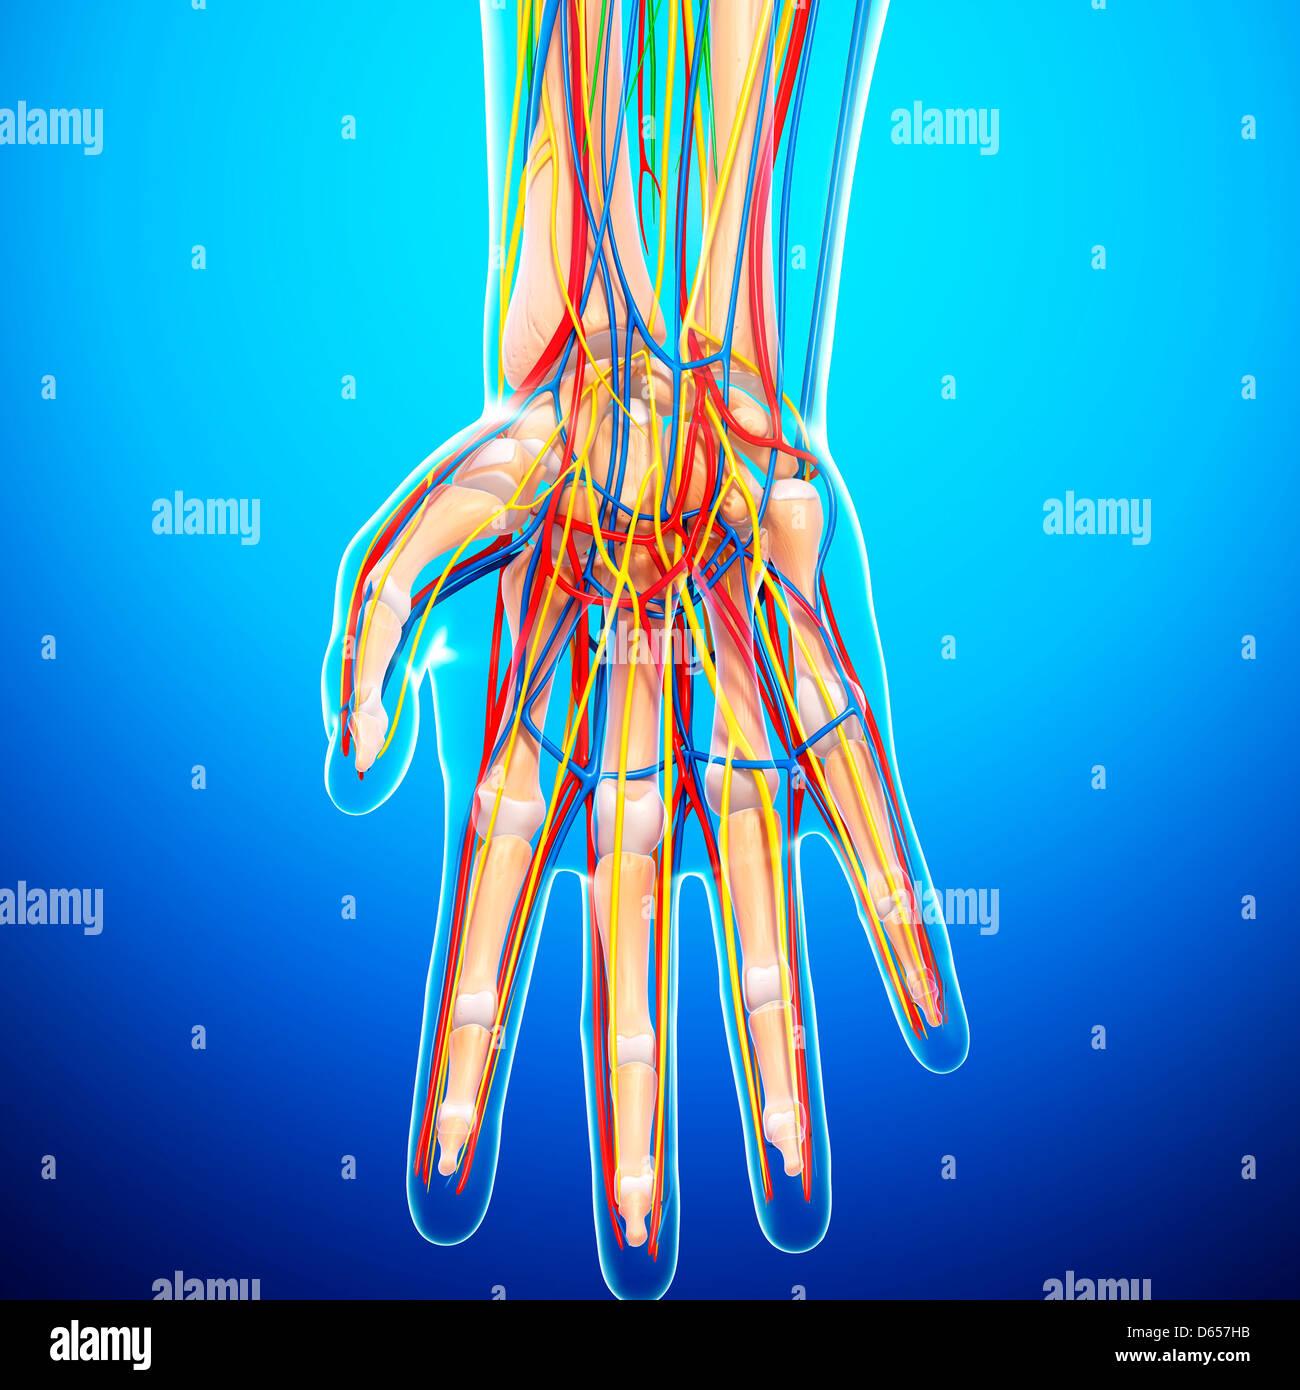 Hand Anatomy Artwork Blue Stock Photos Hand Anatomy Artwork Blue